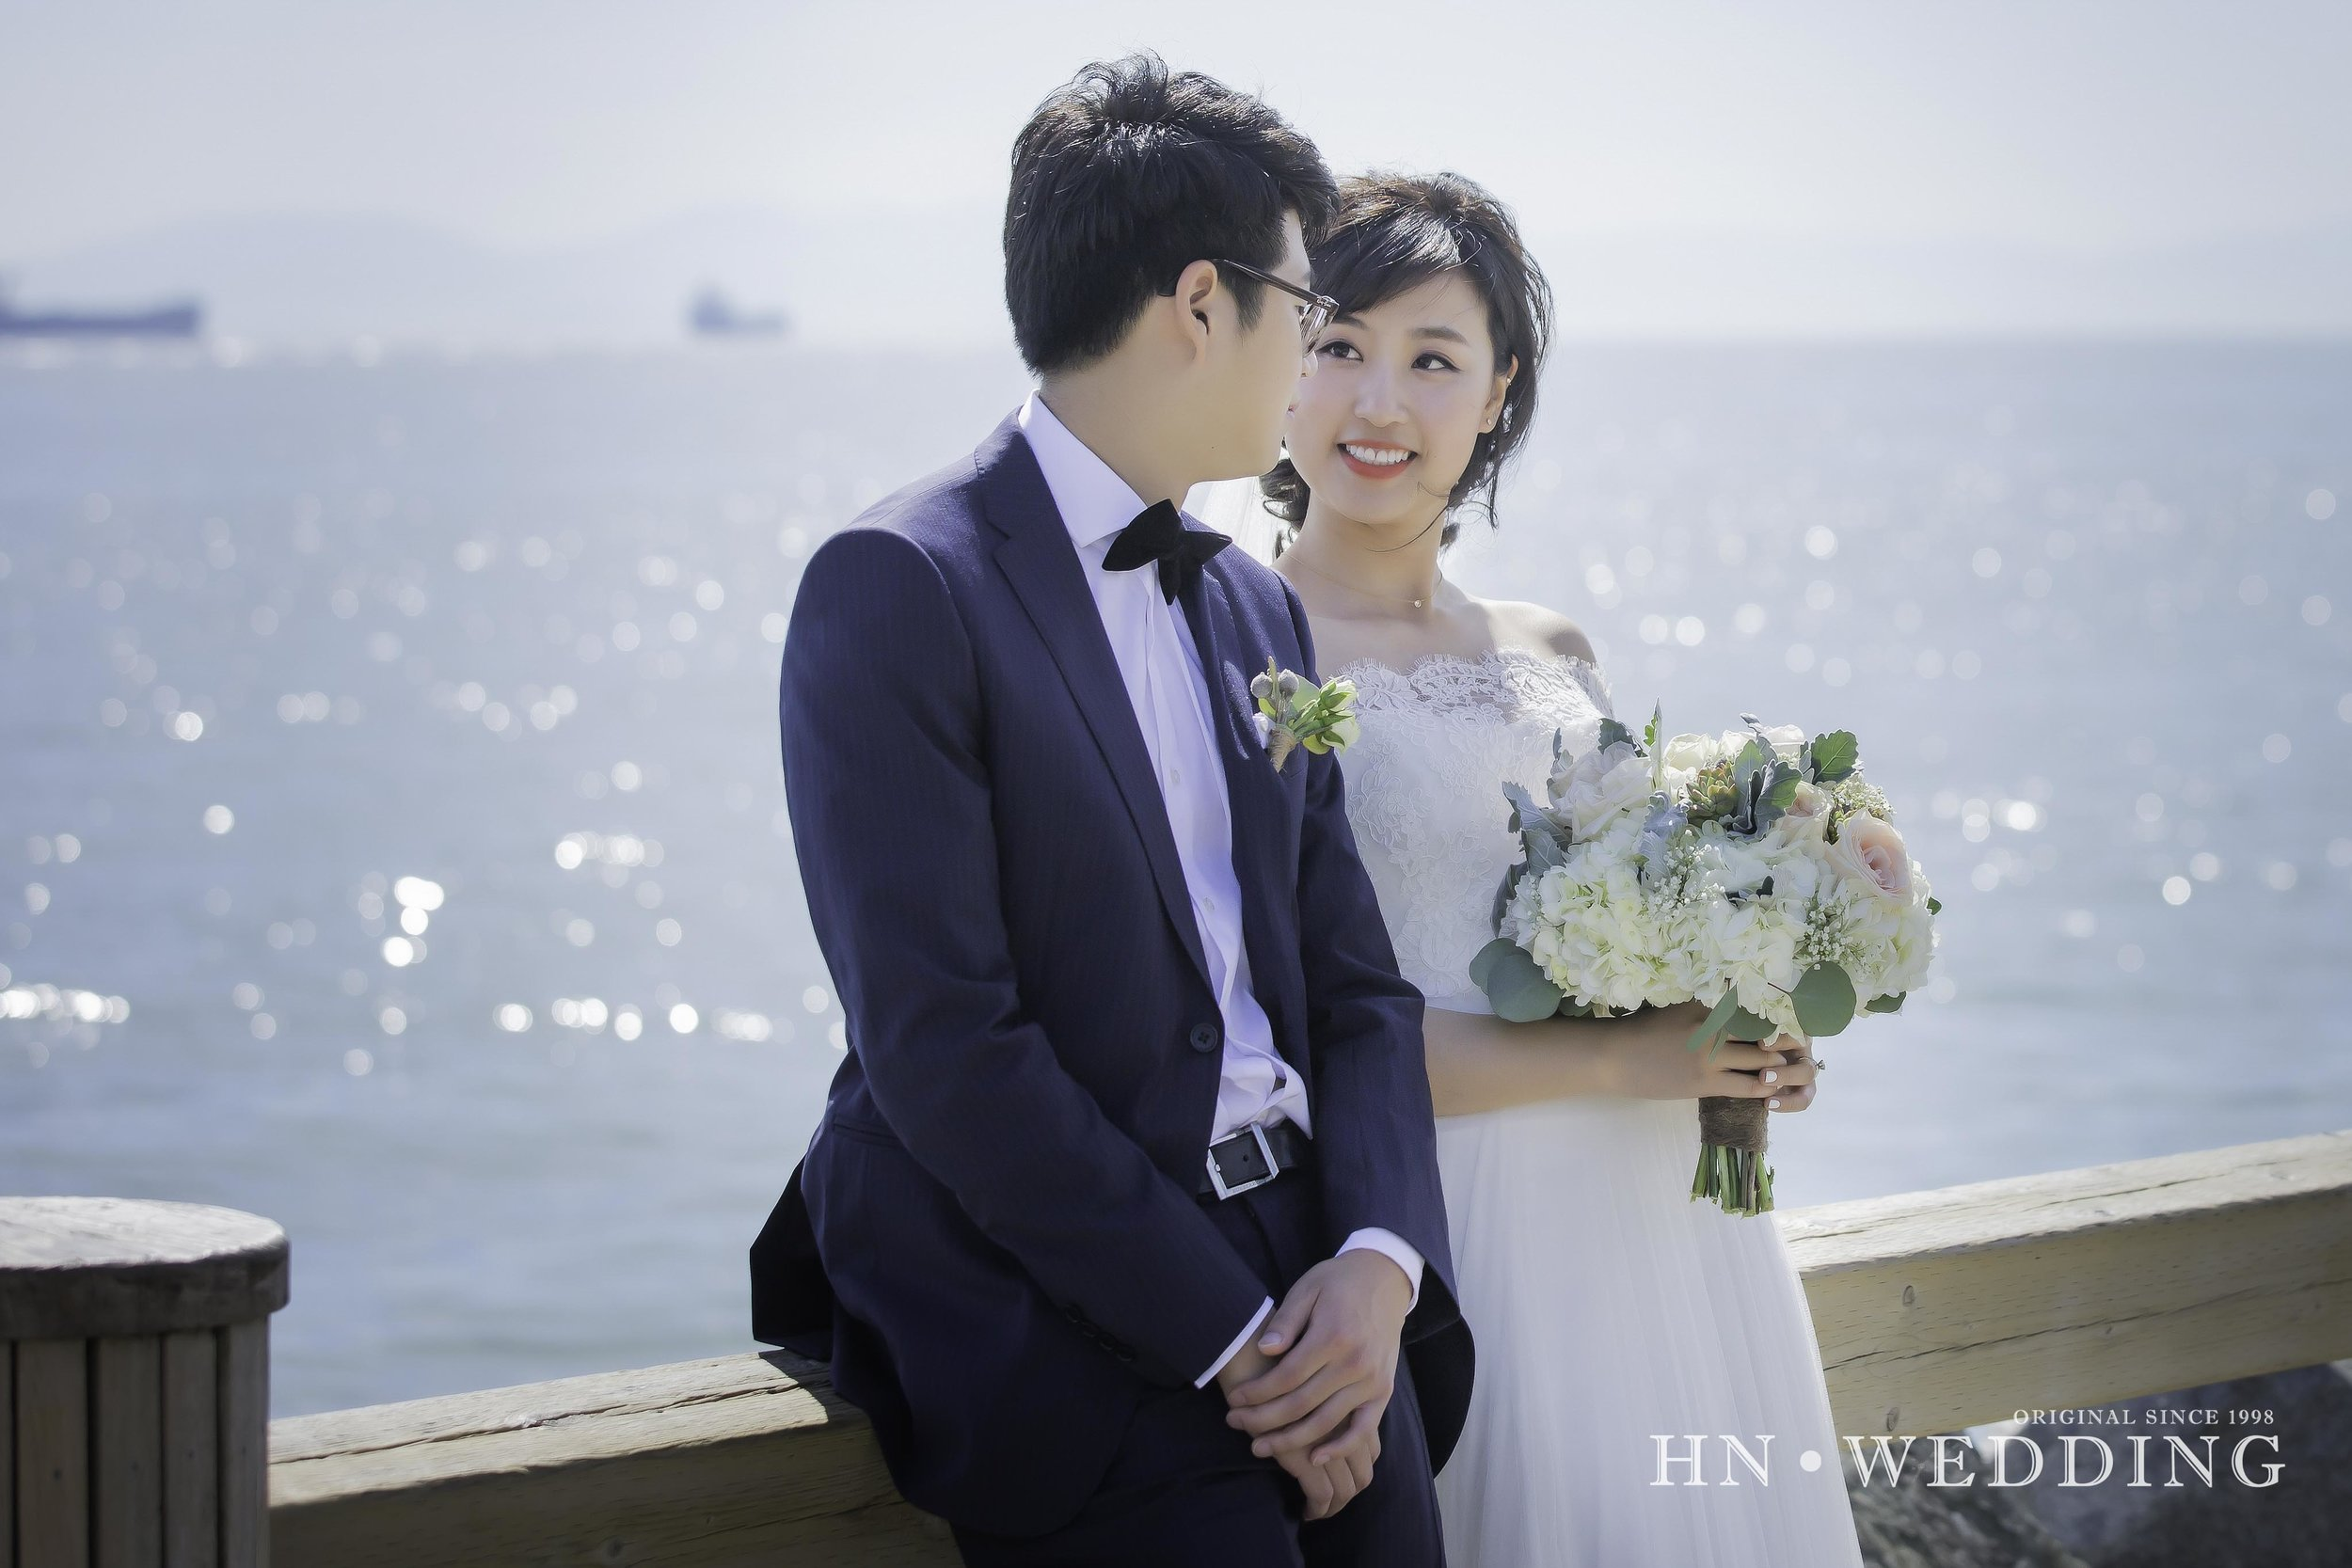 HNwedding-20160826-wedding-1590.jpg